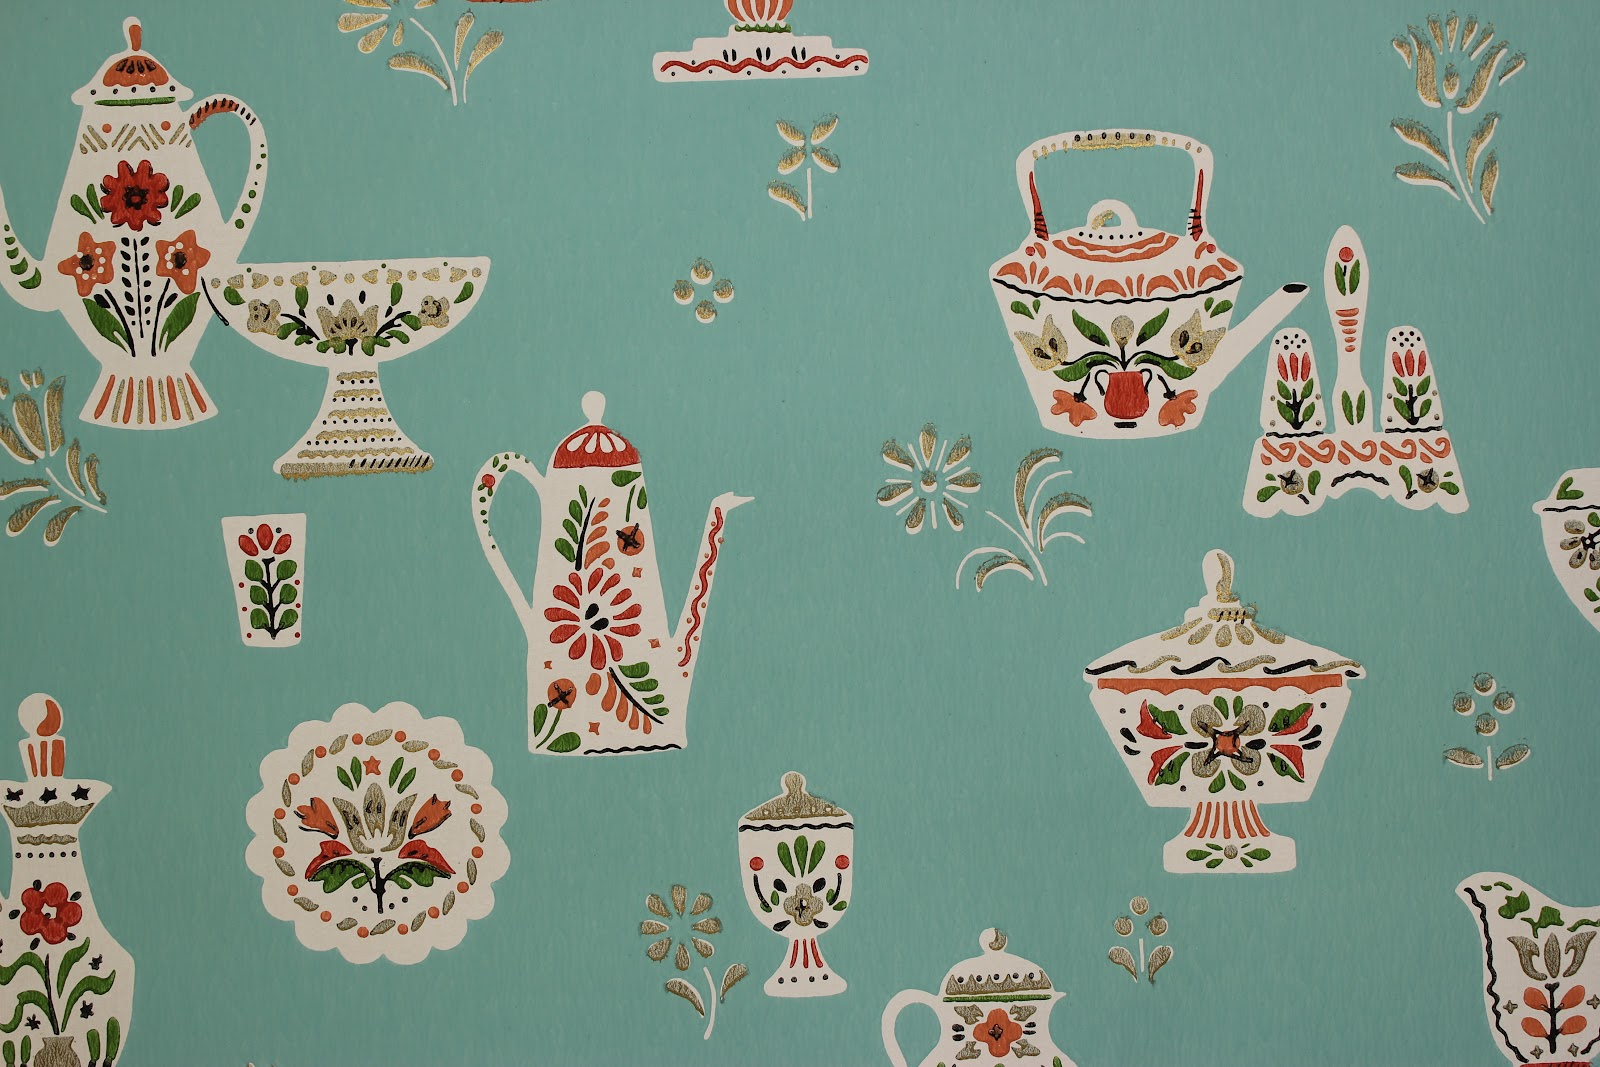 Rosie's Vintage Wallpaper: History of Kitchen Wallpaper